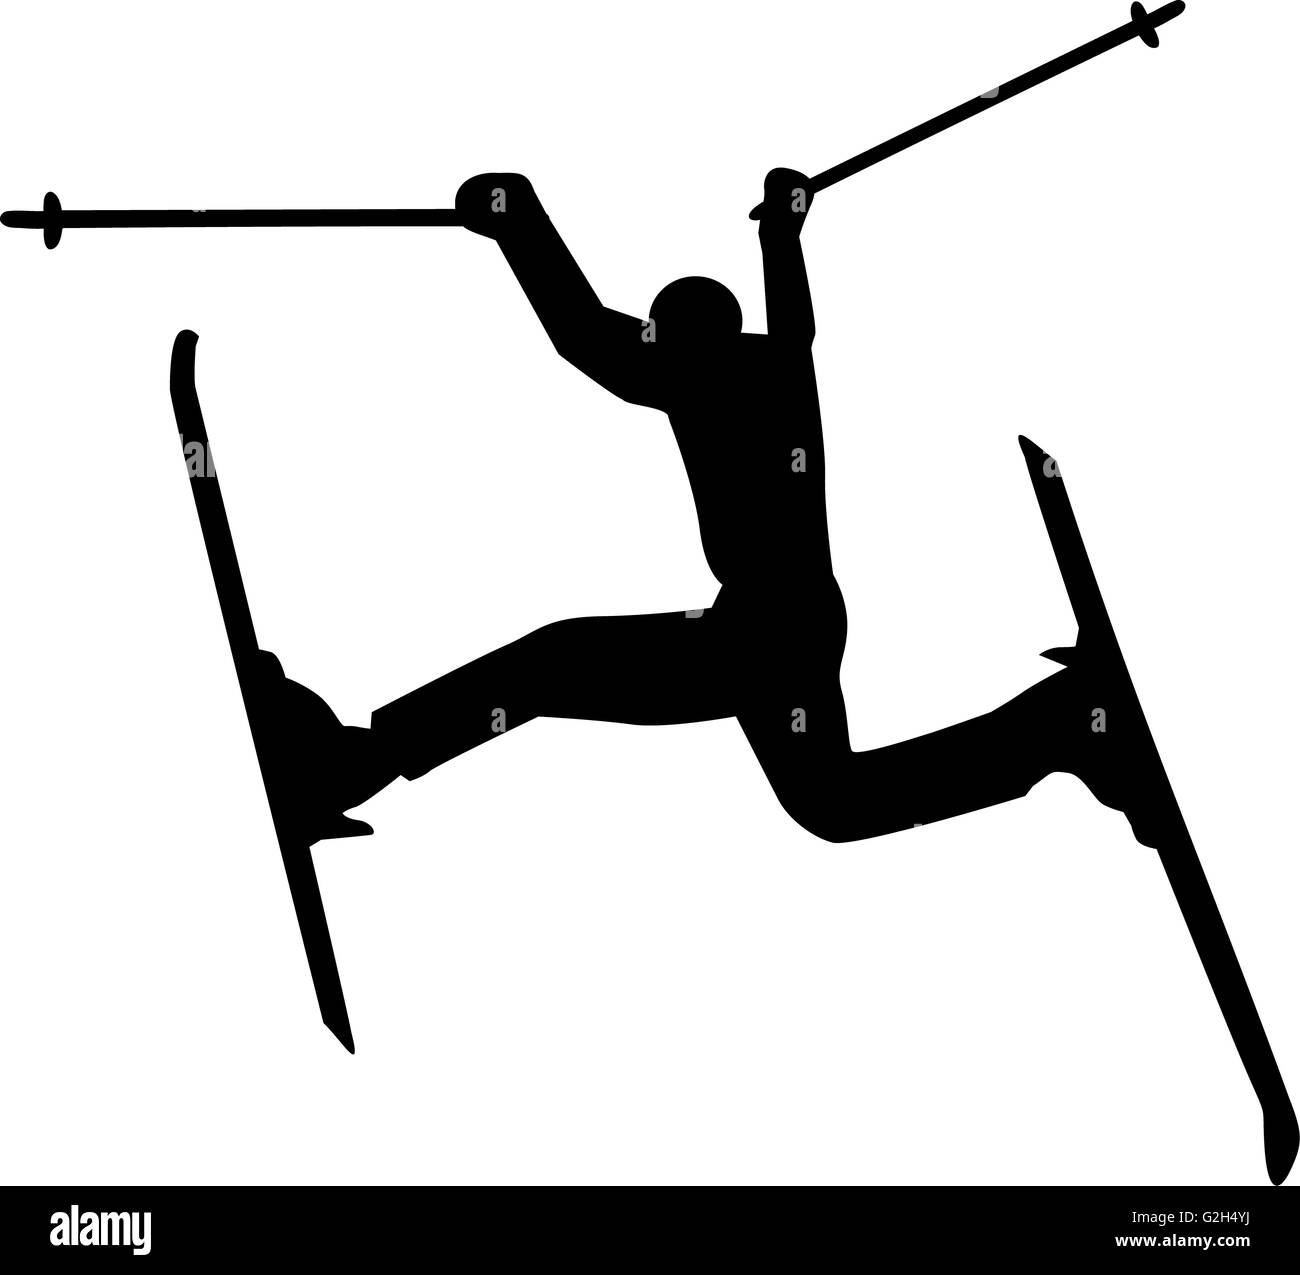 Crazy Skier Silhouette - Stock Image